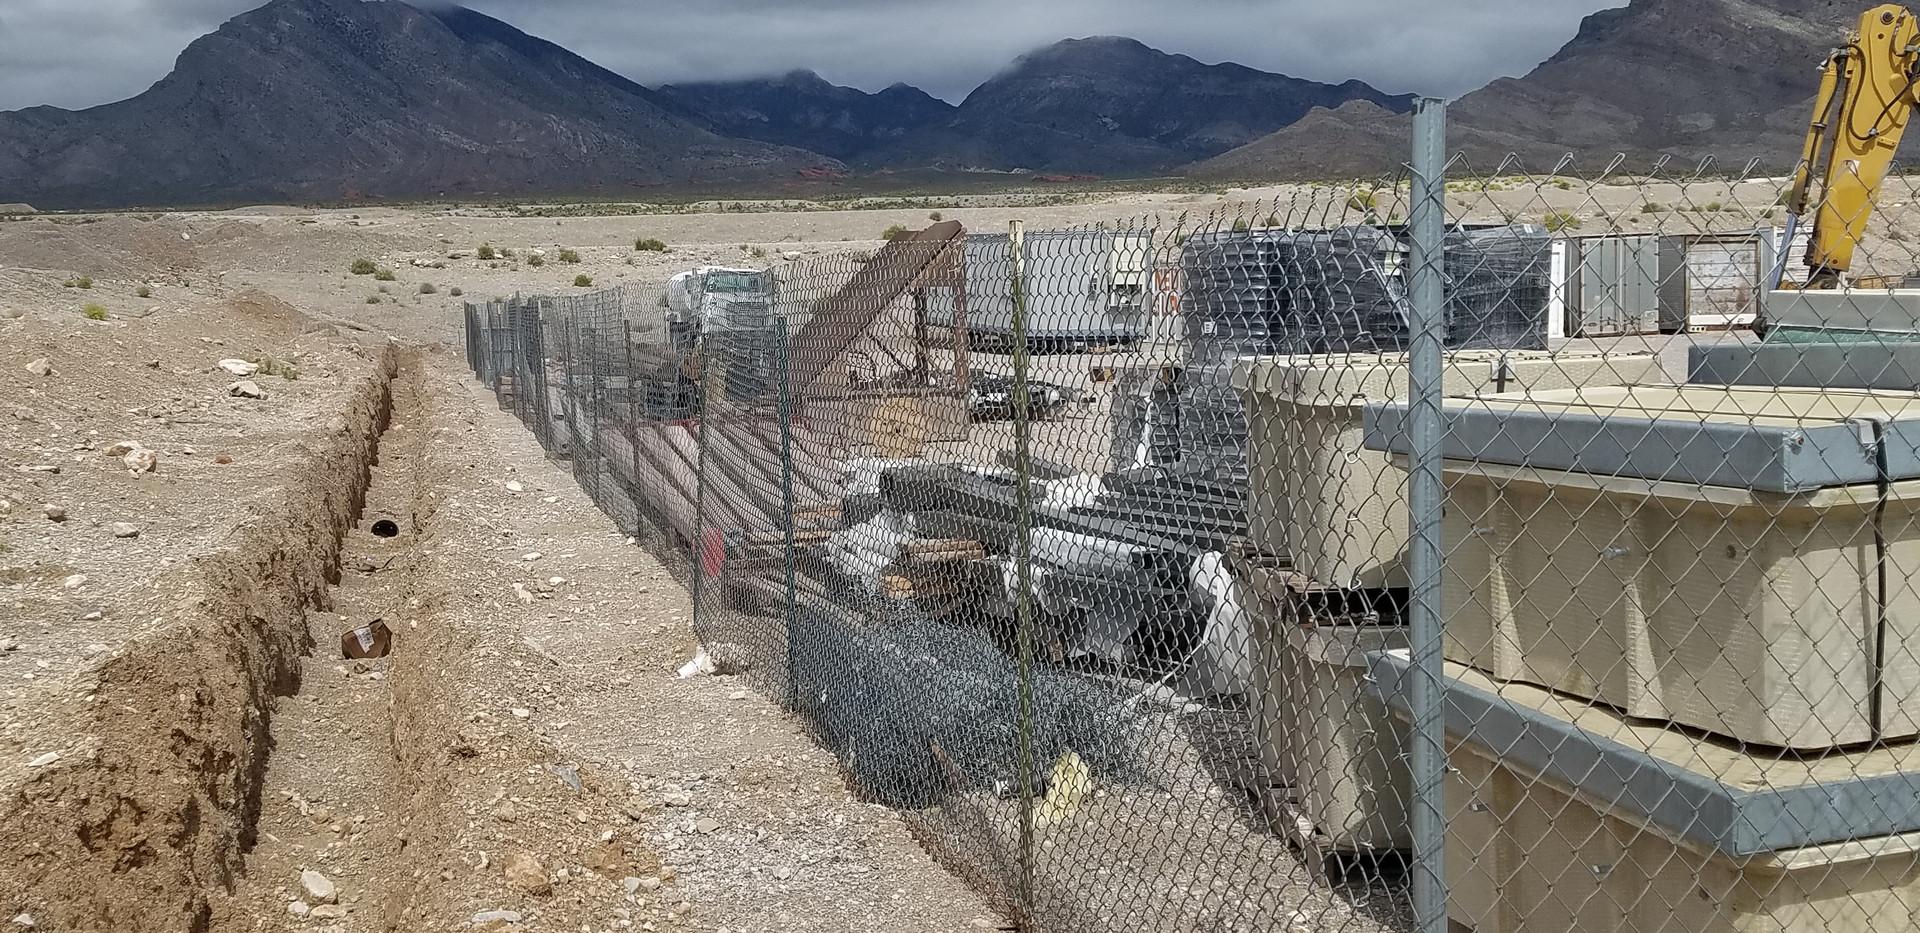 Fence line The Tiberti Fence Company - Las Vegas, Nevada